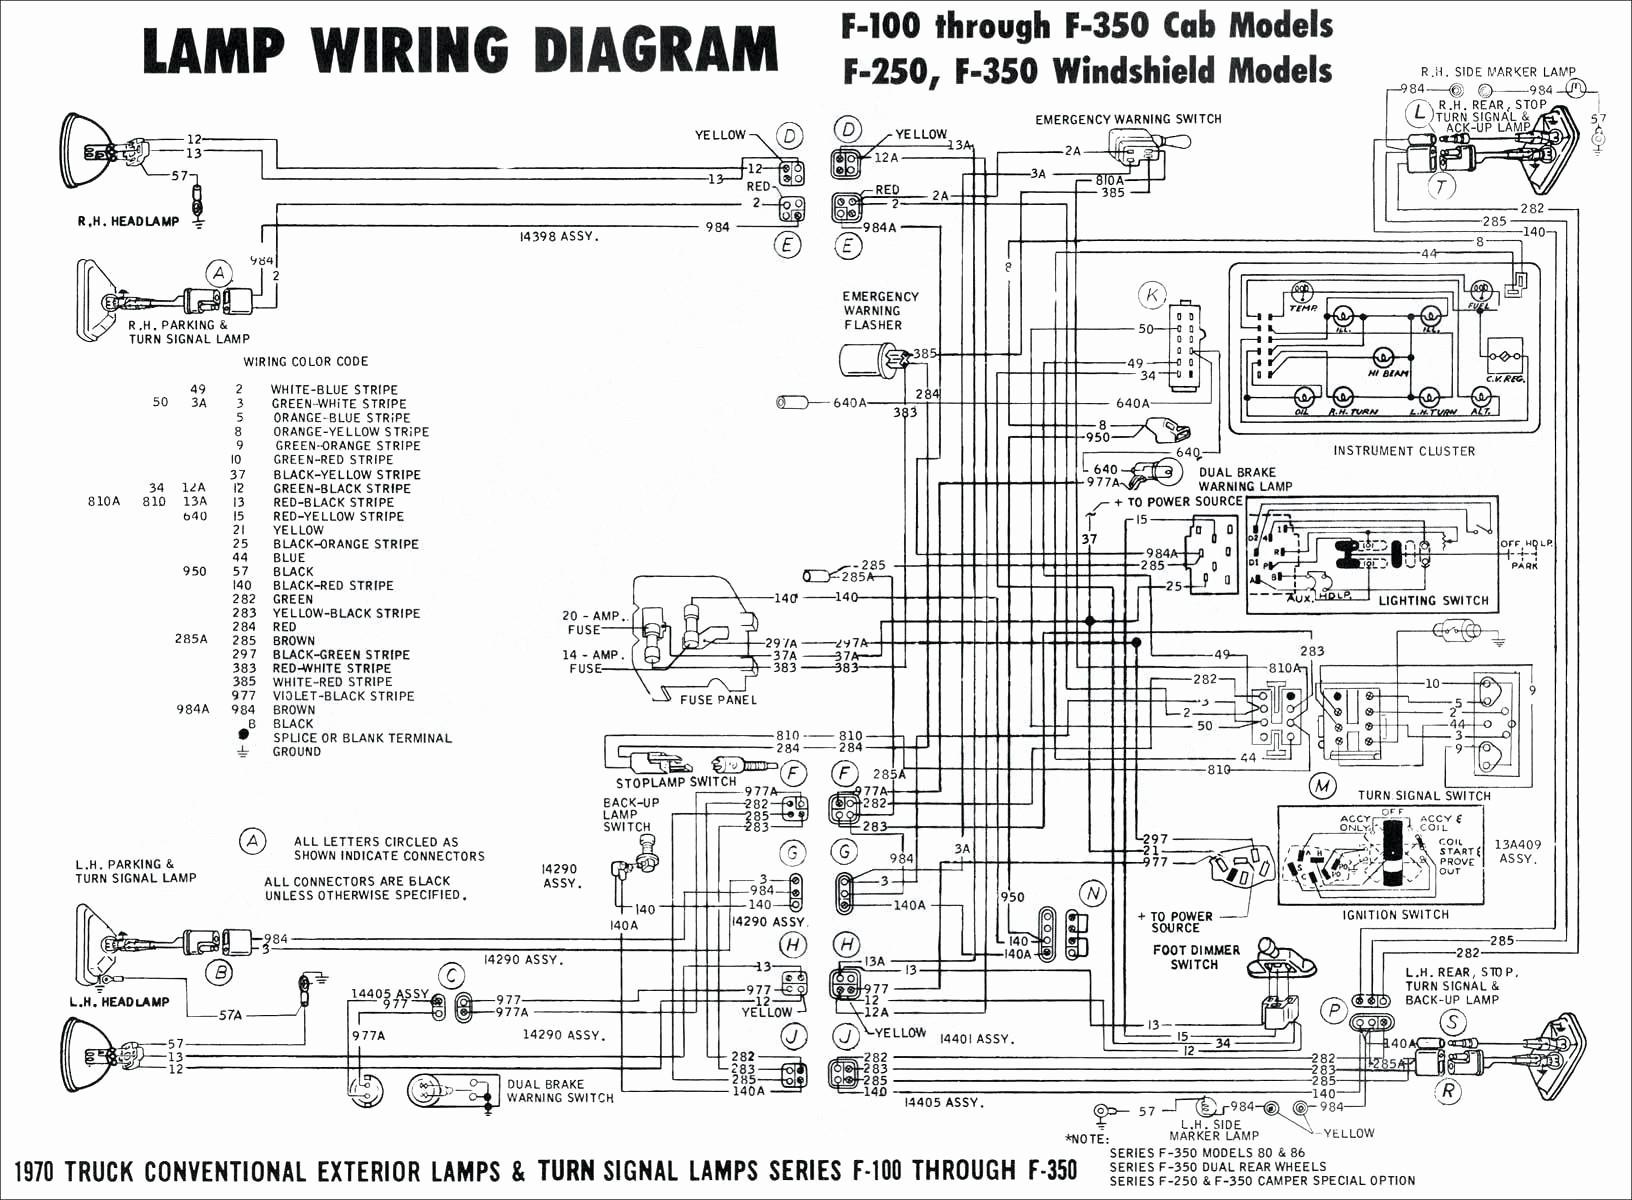 2000 ford F150 Ignition Switch Wiring Diagram Diagram] Basic Turn Signal Ke Wiring Diagram Full Version Hd Of 2000 ford F150 Ignition Switch Wiring Diagram ford Transfer Case Wiring Diagram Wiring Diagram Symbols